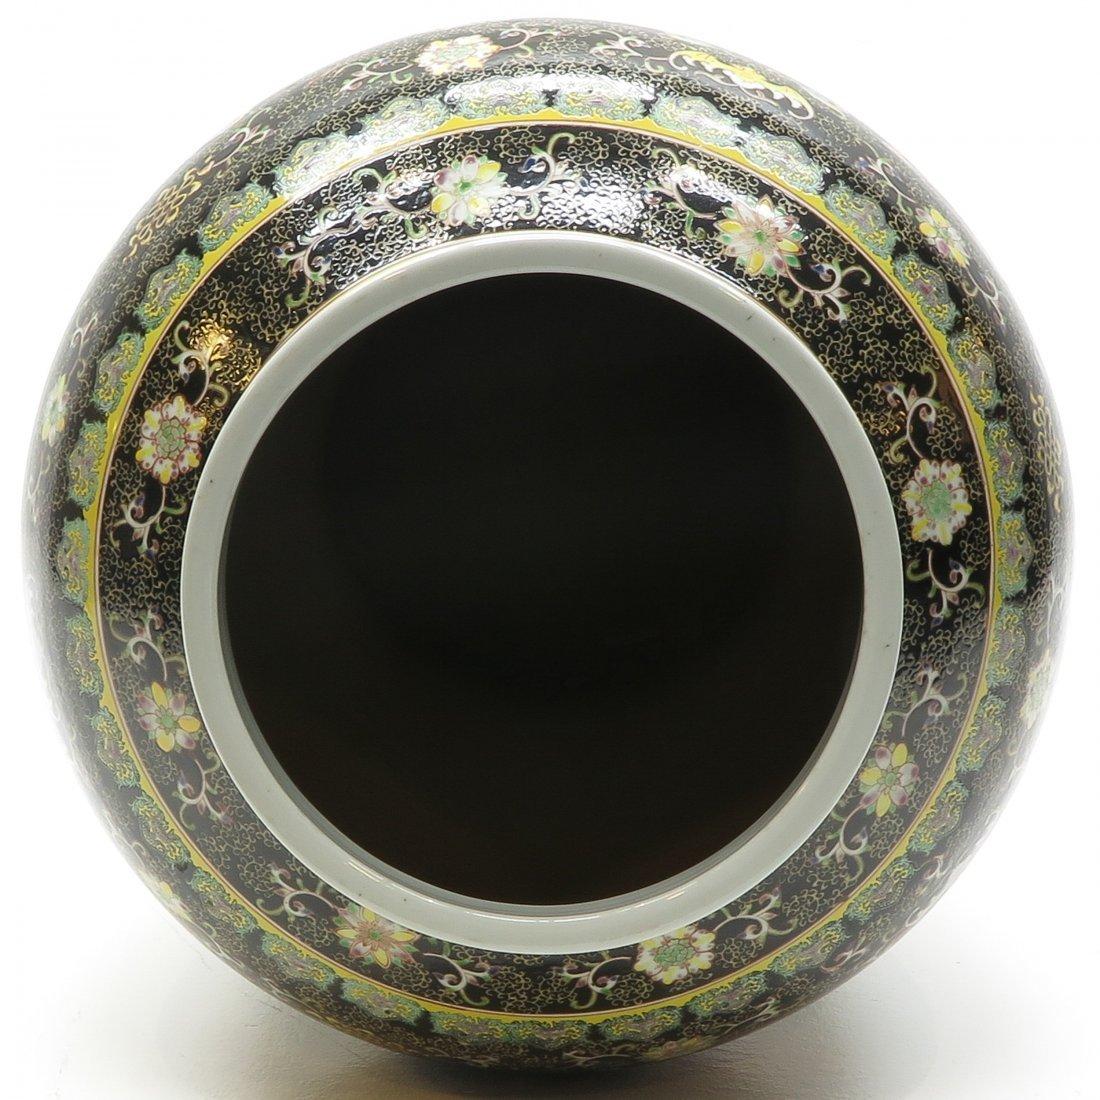 China Porcelain Famille Noir Lidded Vase - 5